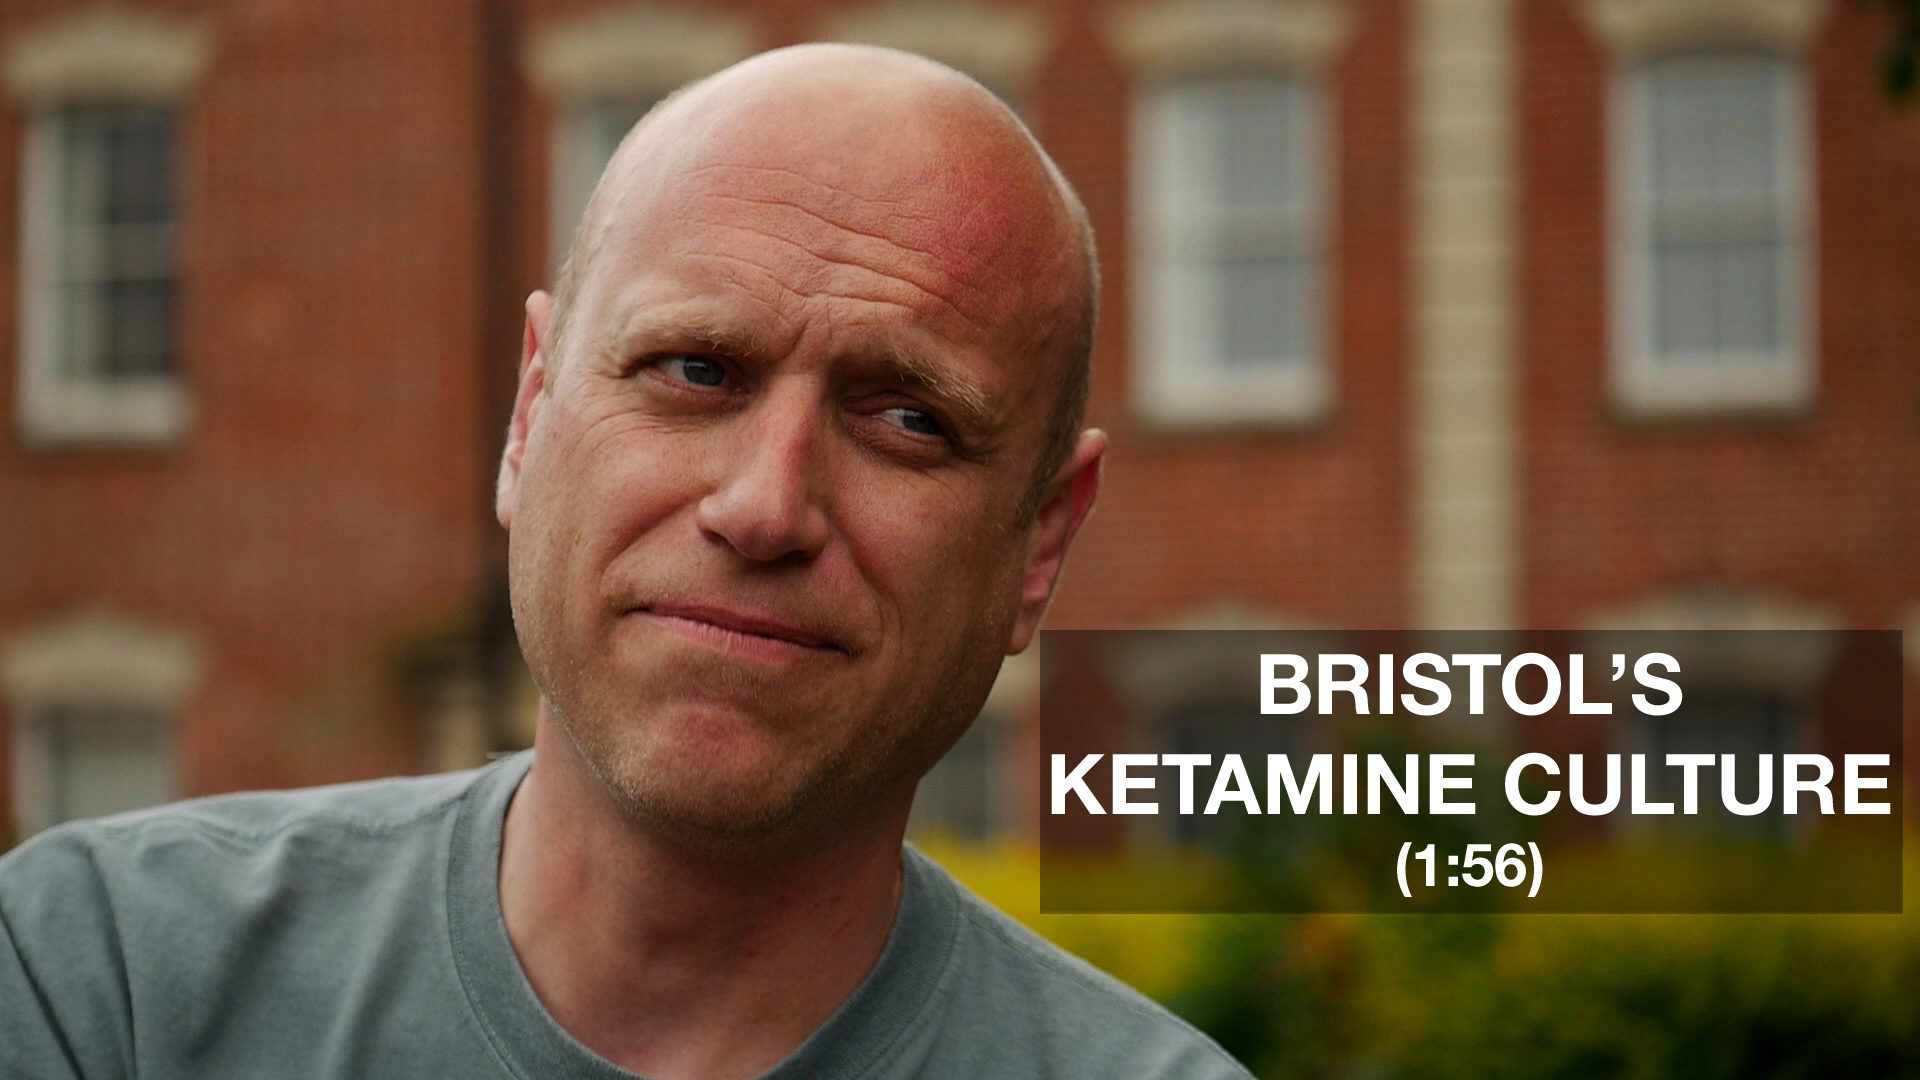 Bristol drugs counsellor Jim Bartlett